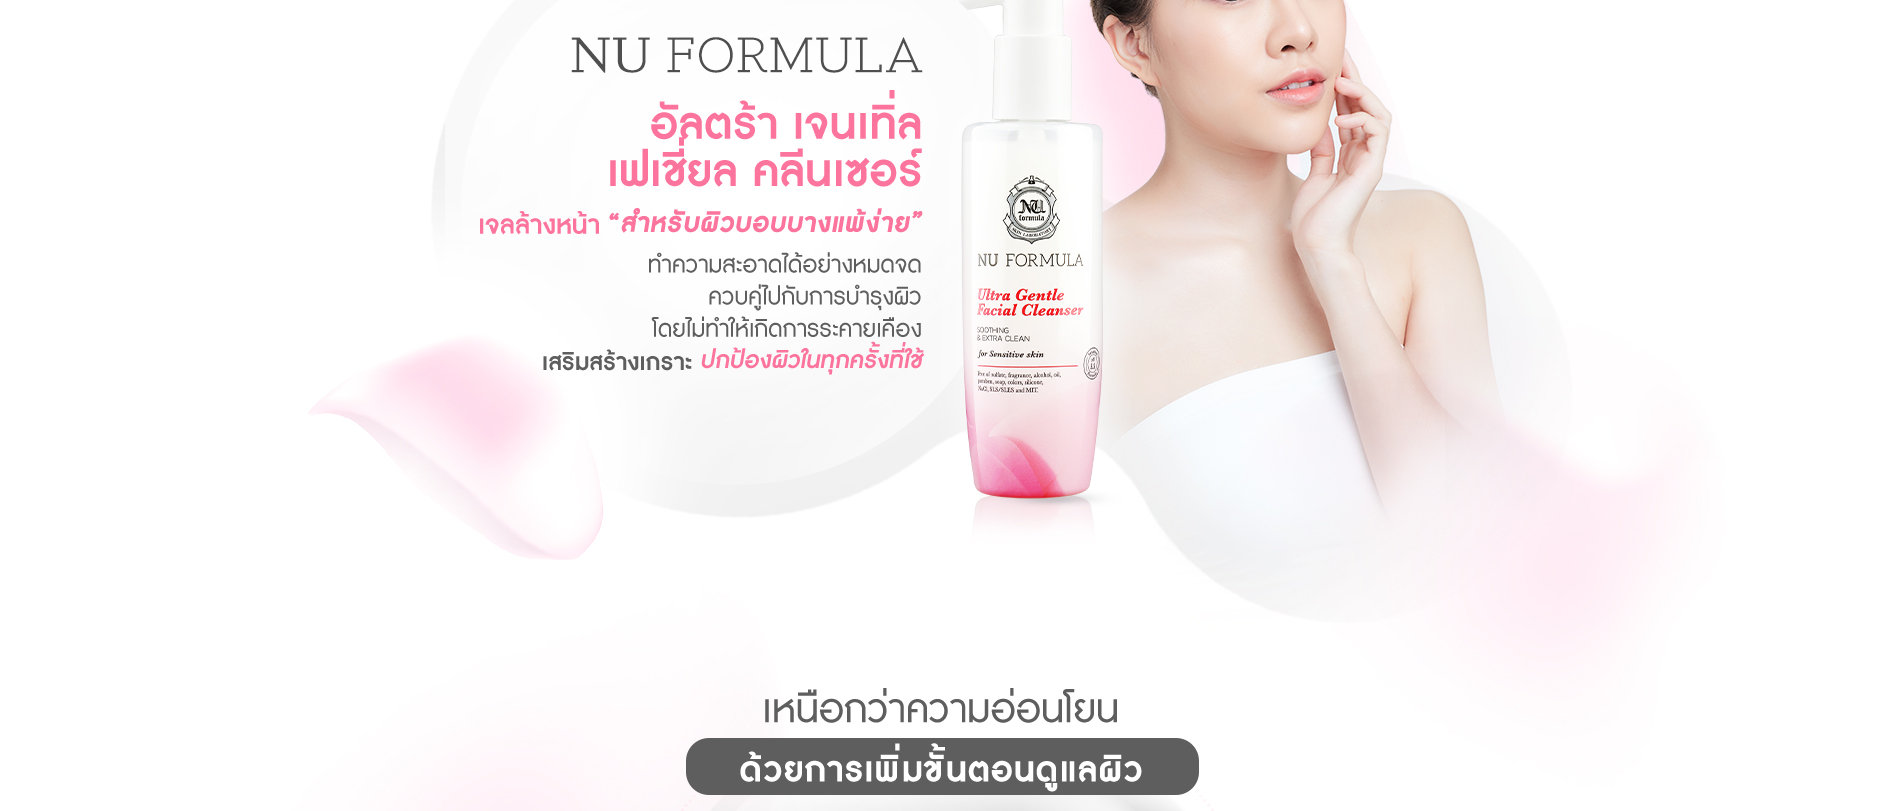 Nu_Formula_Ultra-Gentle-Facial-Cleanser-